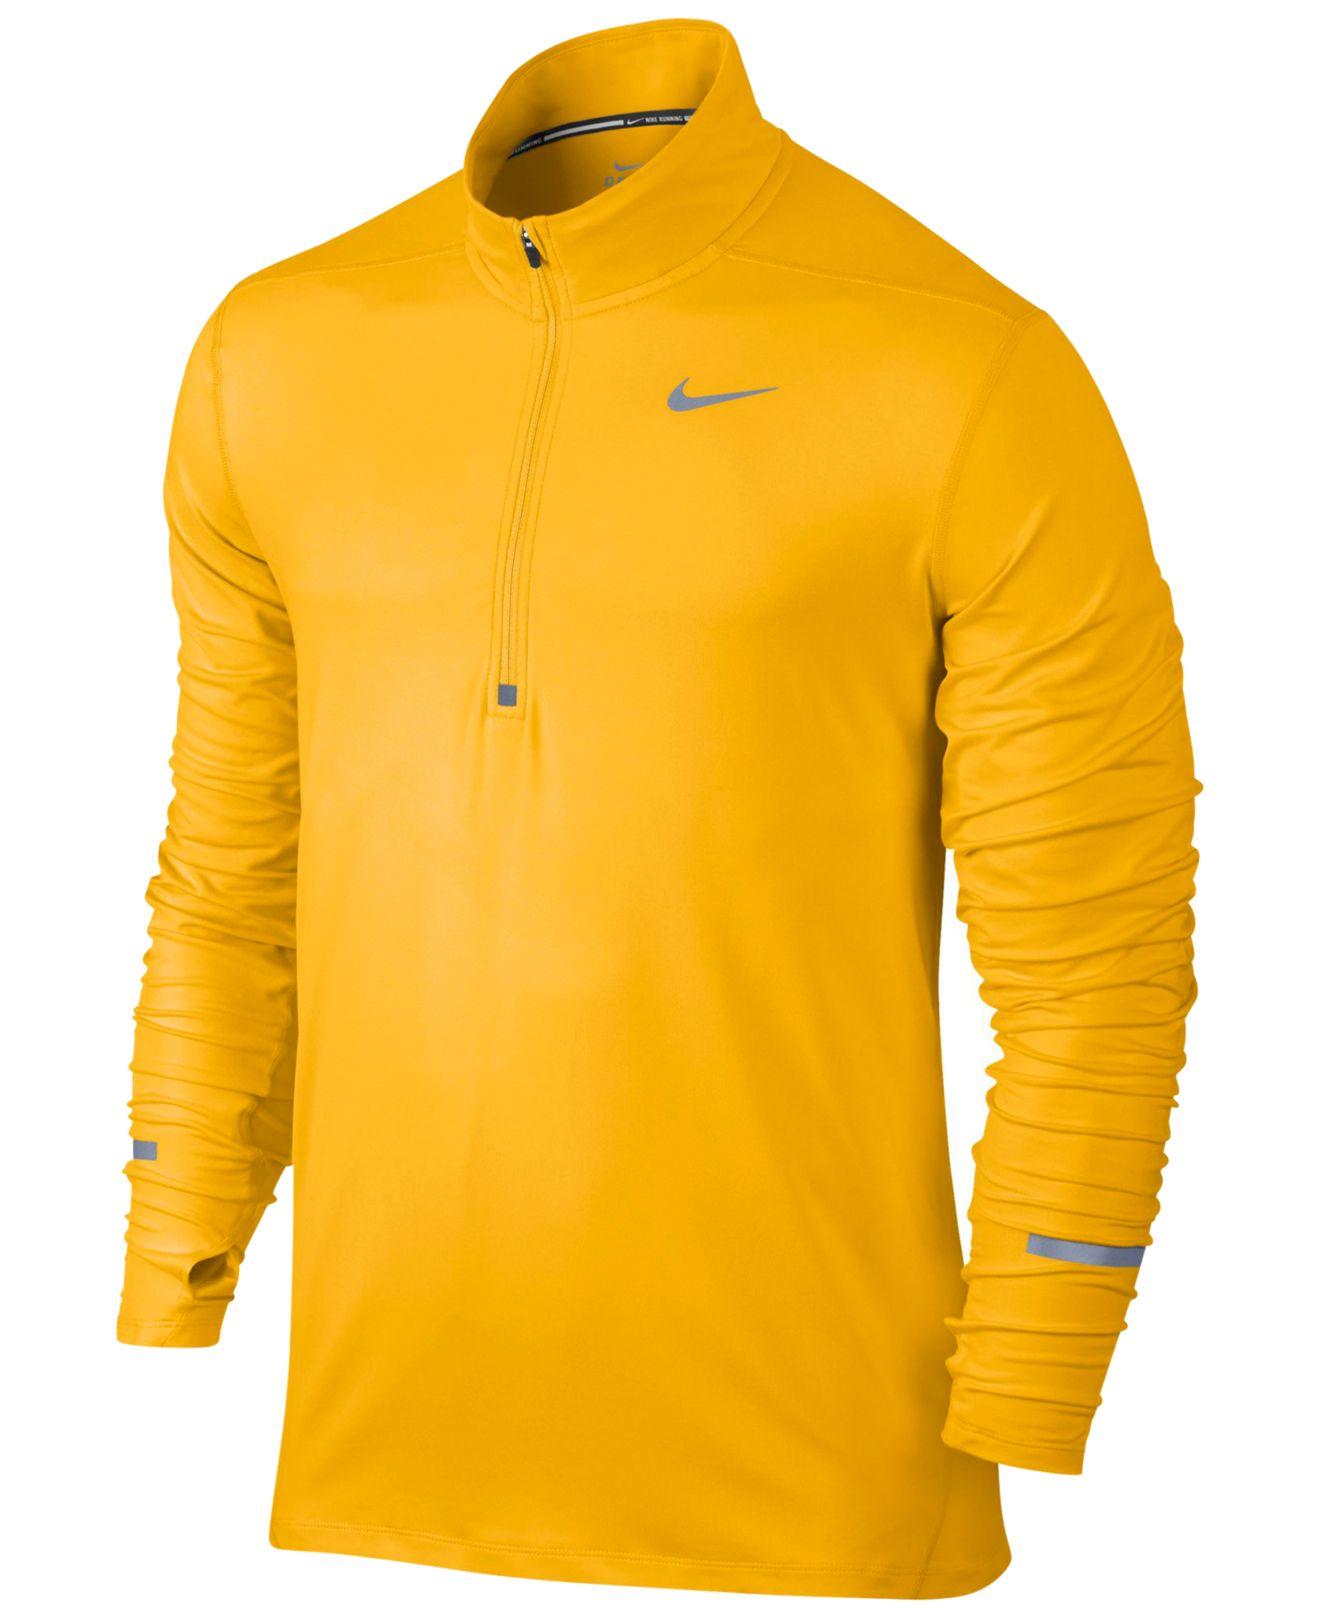 3bbb672a Nike Men's Element Dri-fit Half-zip Running Shirt in Yellow for Men ...